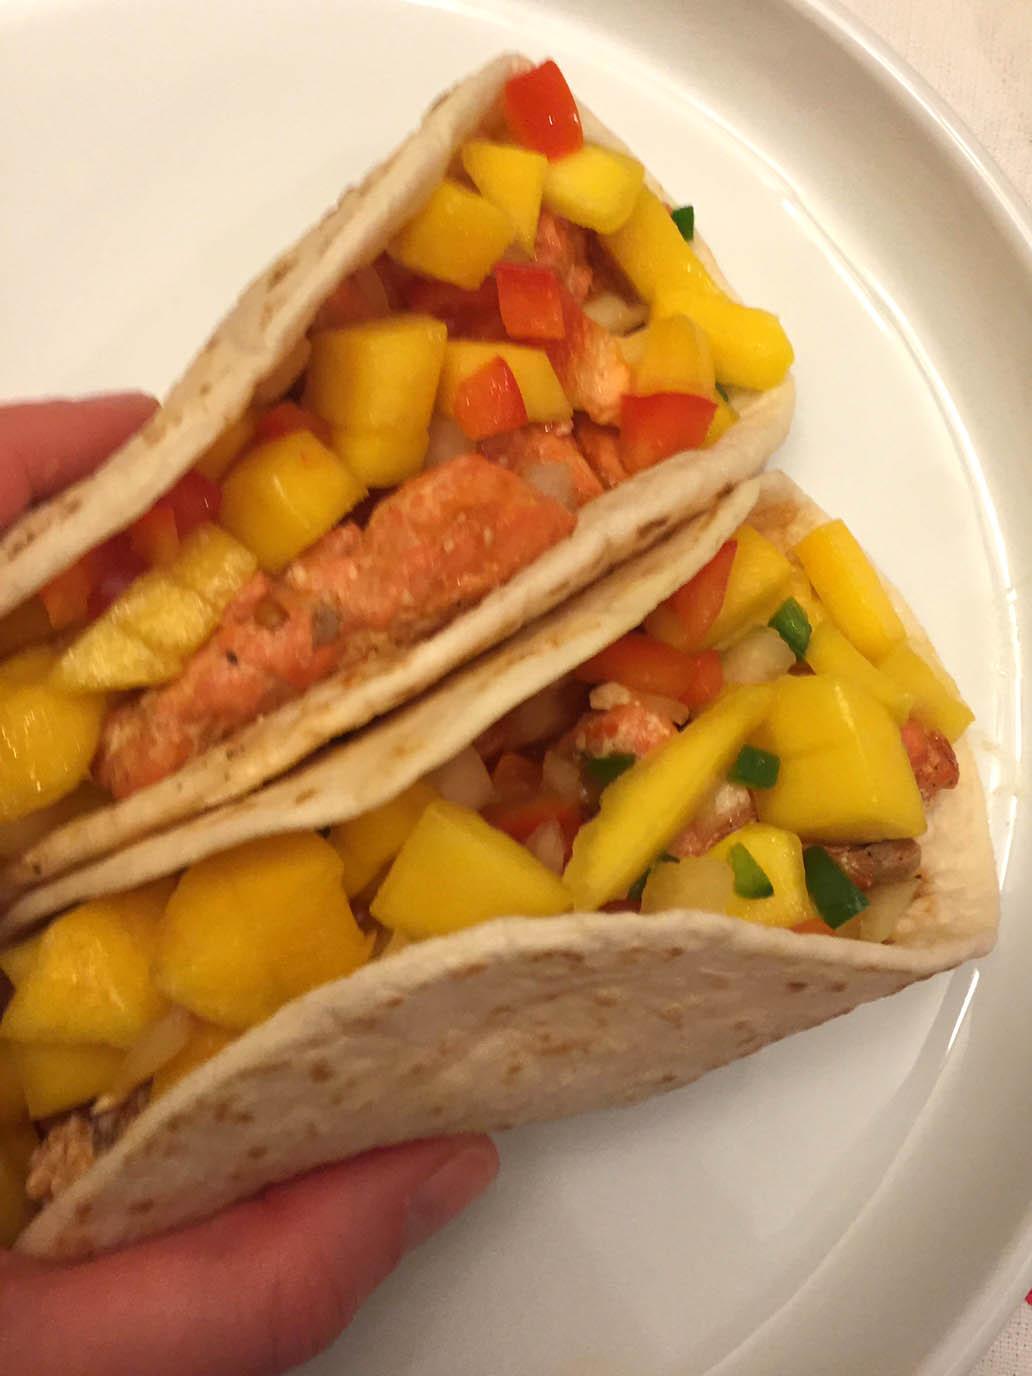 Amazing Fish Tacos Recipe With Mango Salsa!